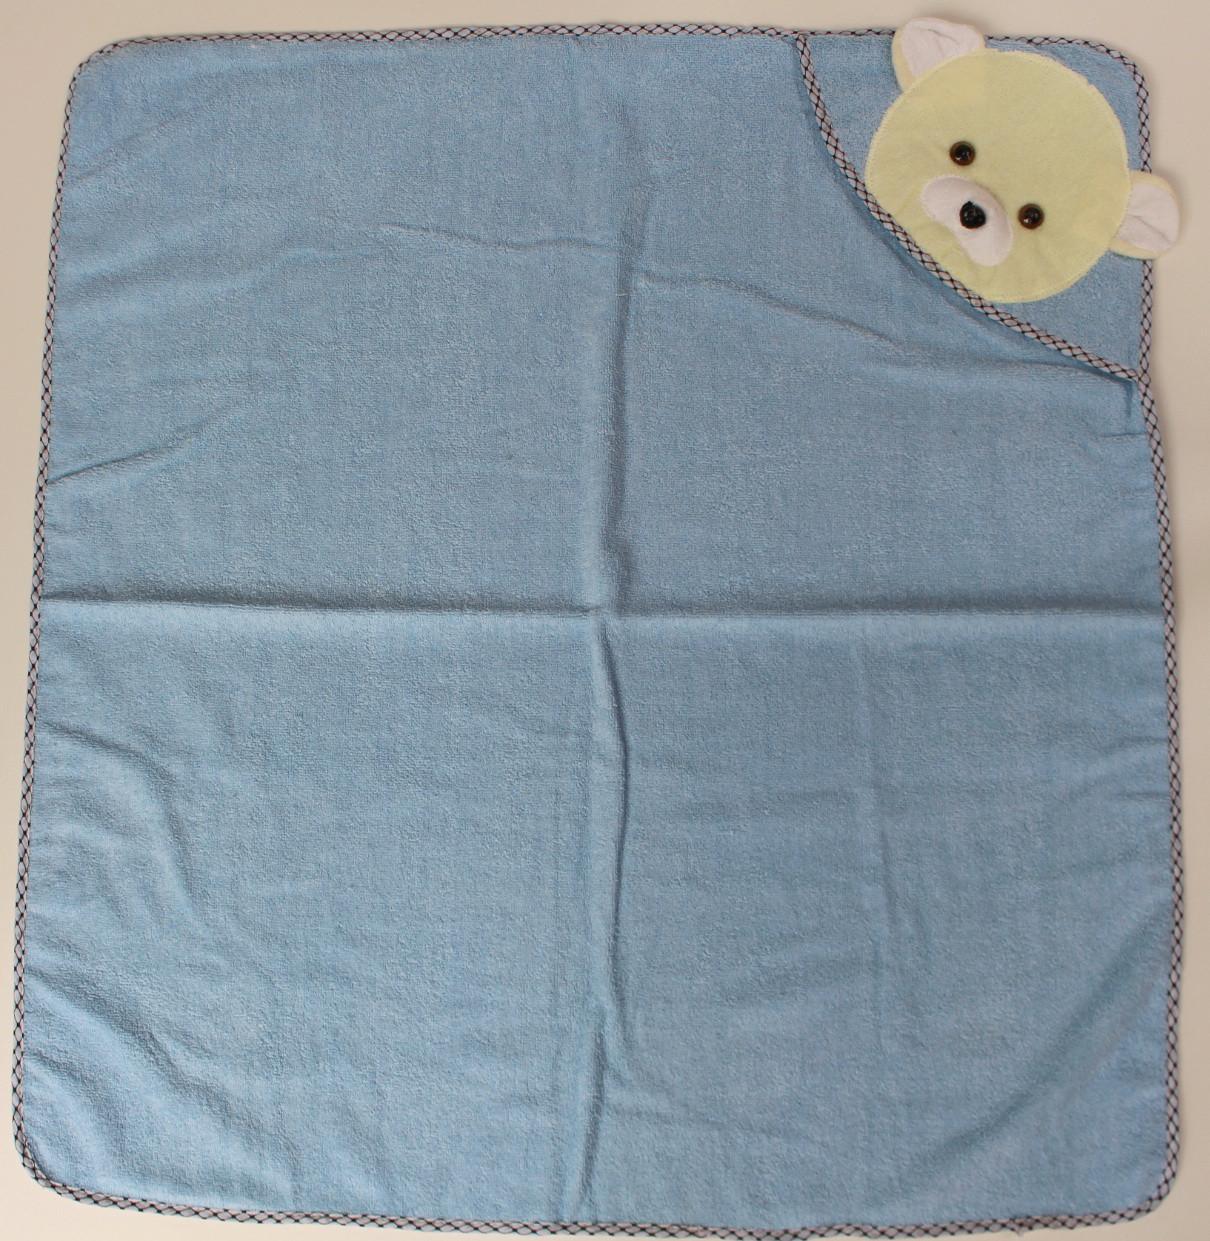 Полотенце уголок для купания ребенка код 708-13